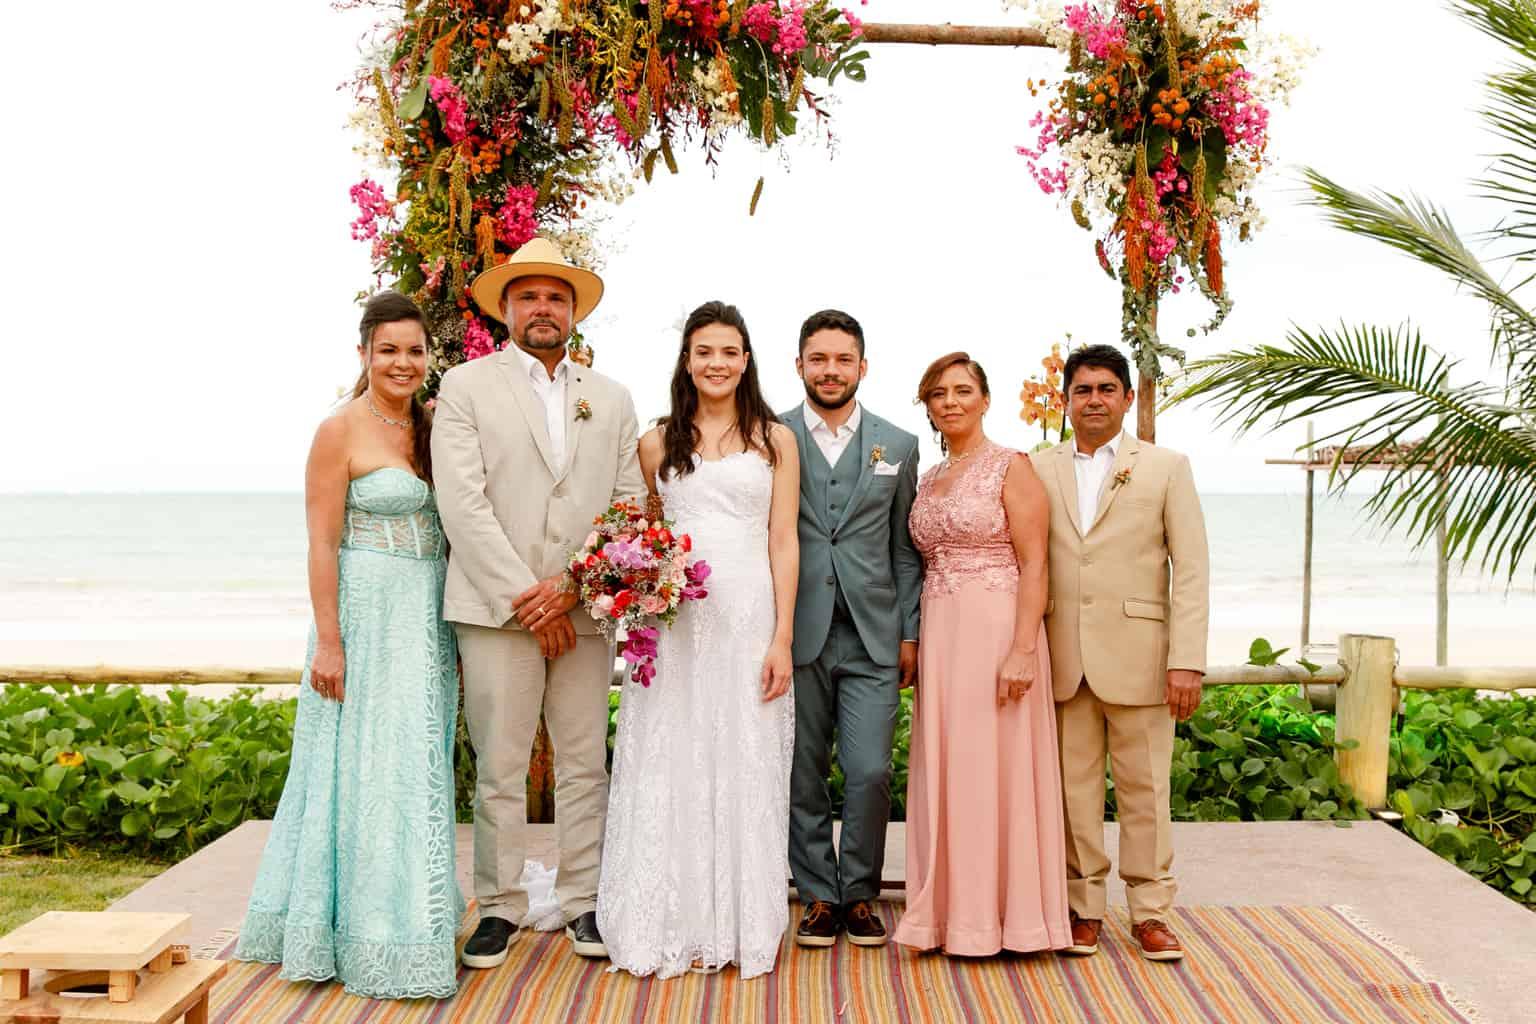 Casamento-Emanuelle-e-Alysson-Fotografia-Tadeu-Nanó-e-Luca-Antunes117